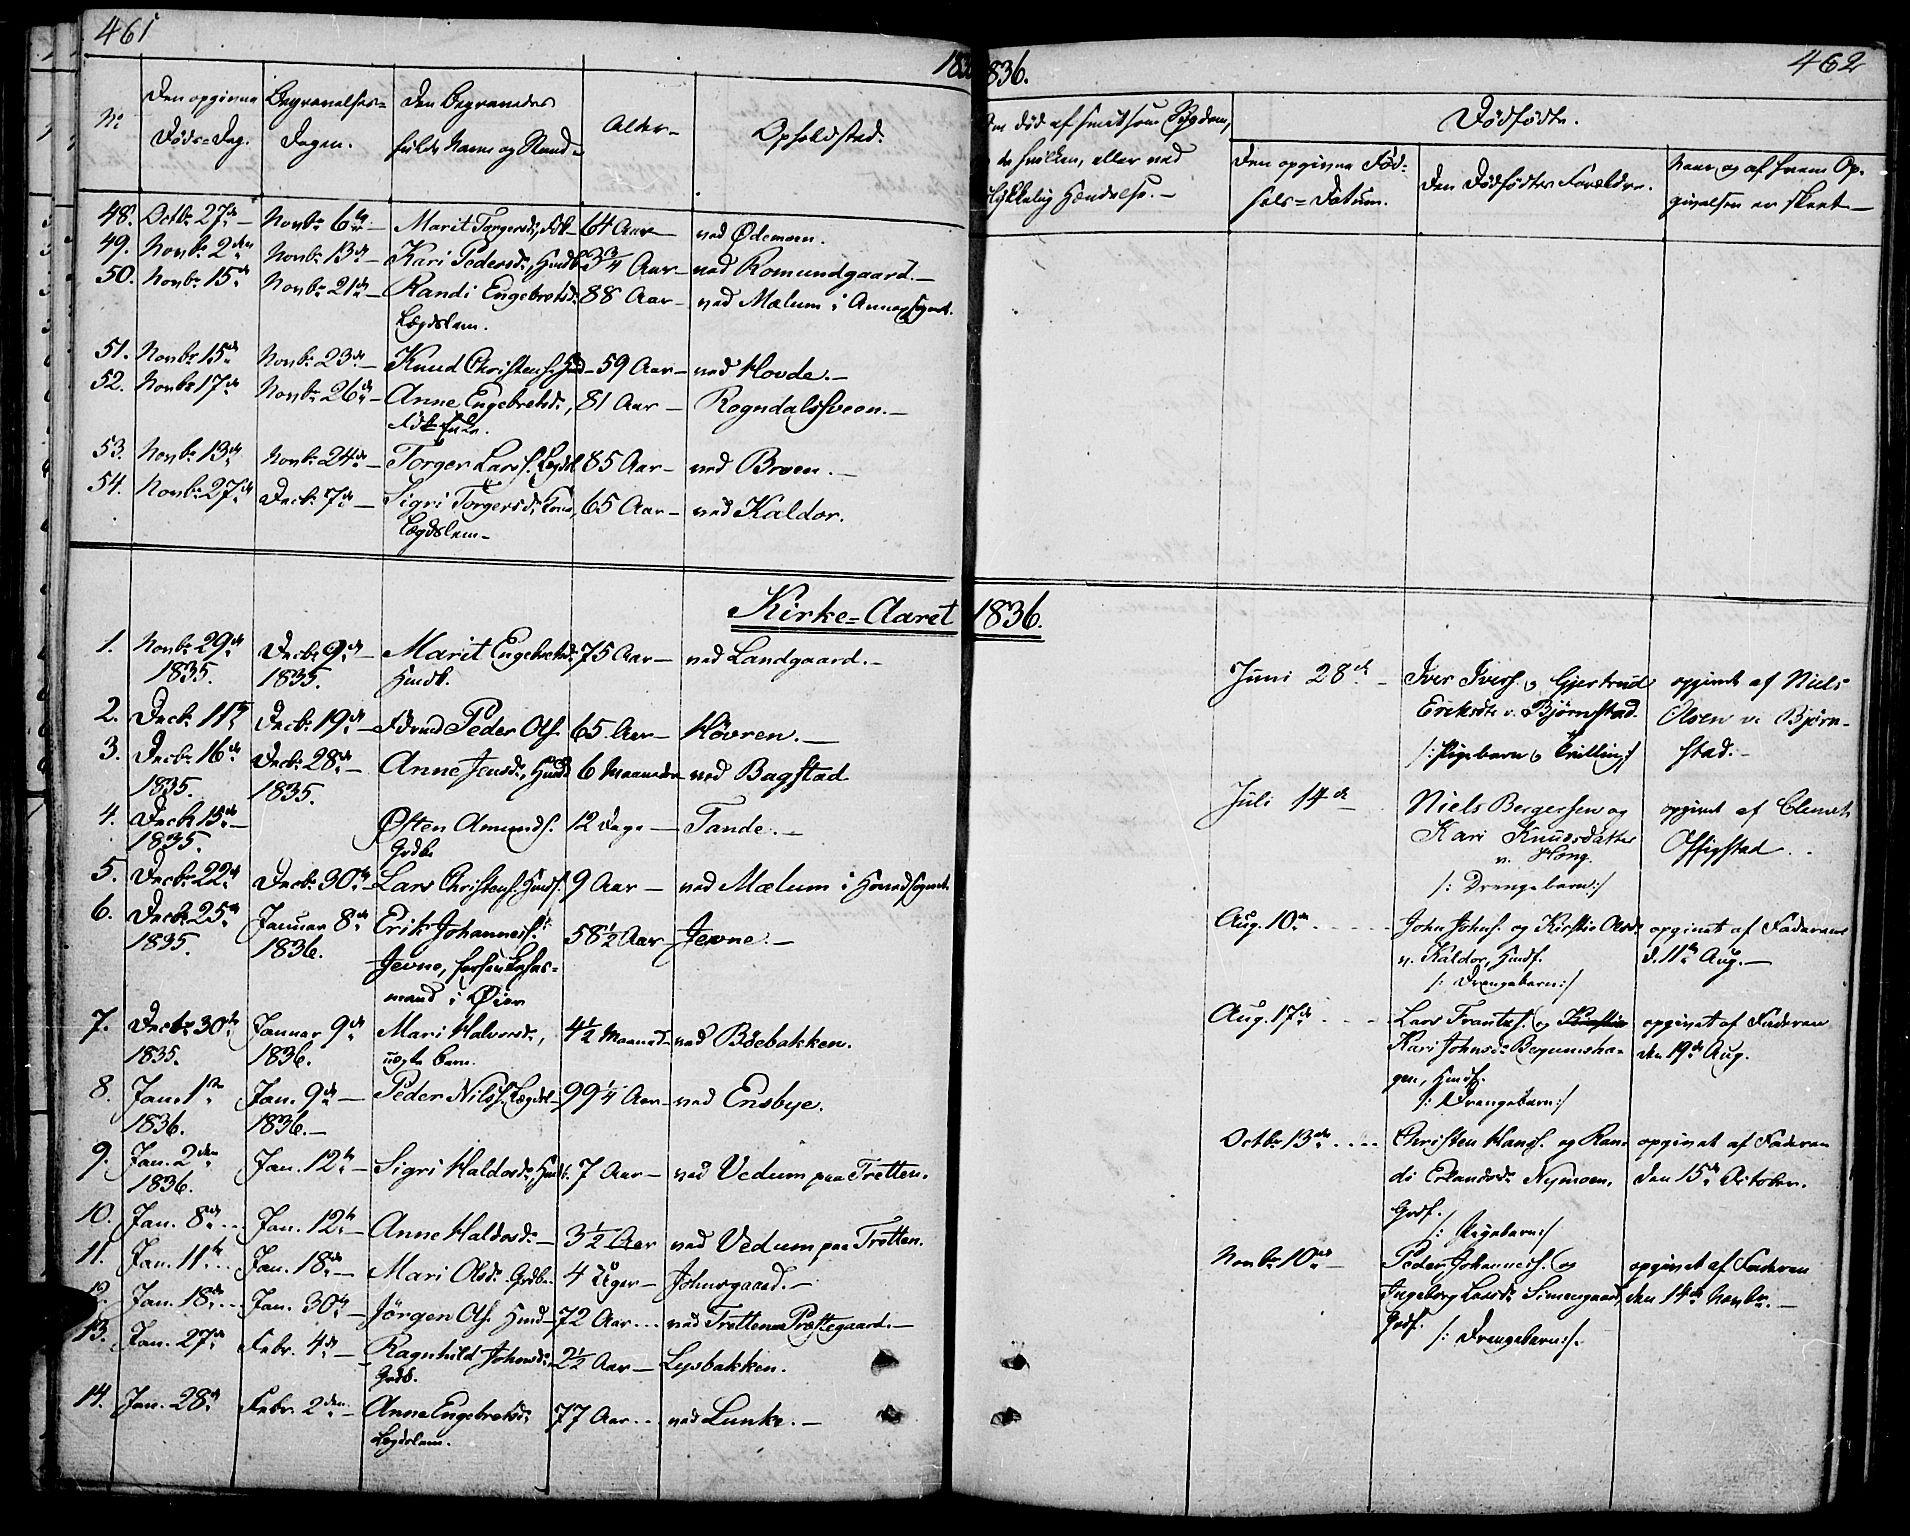 SAH, Øyer prestekontor, Ministerialbok nr. 4, 1824-1841, s. 461-462